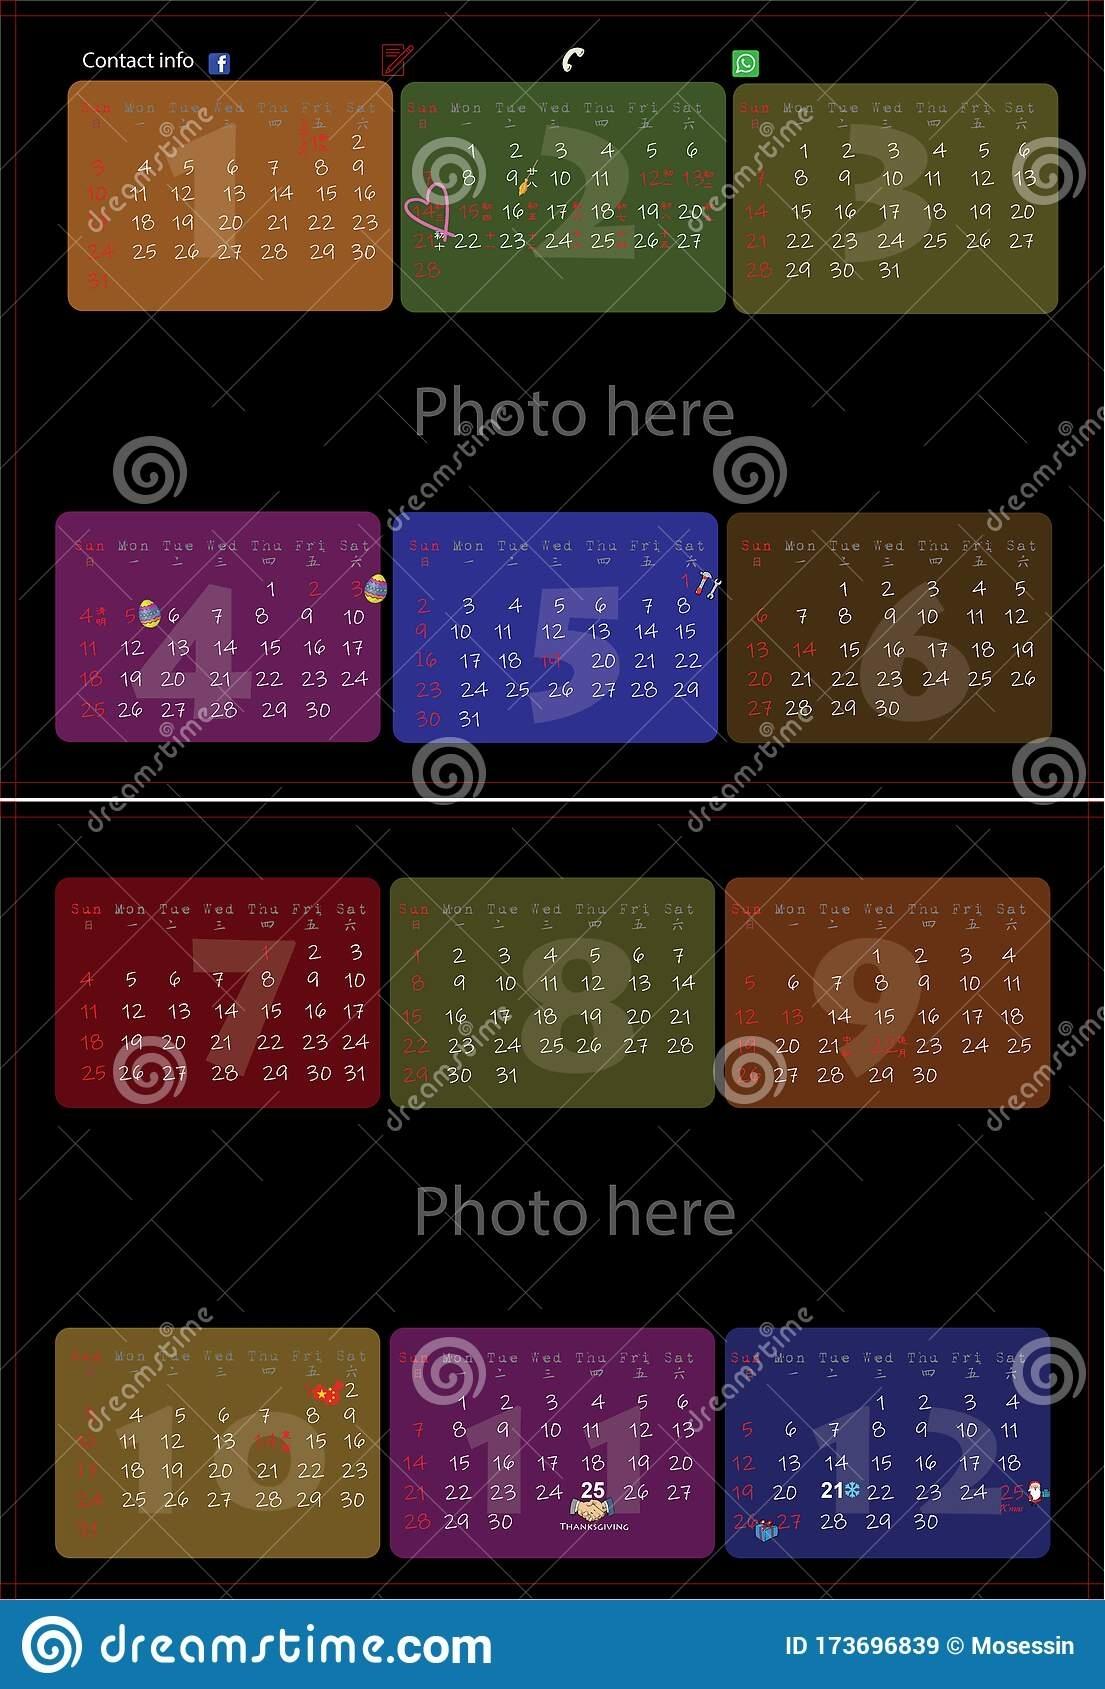 2021 Hk Calendar Template Vector Stock Vector - Illustration